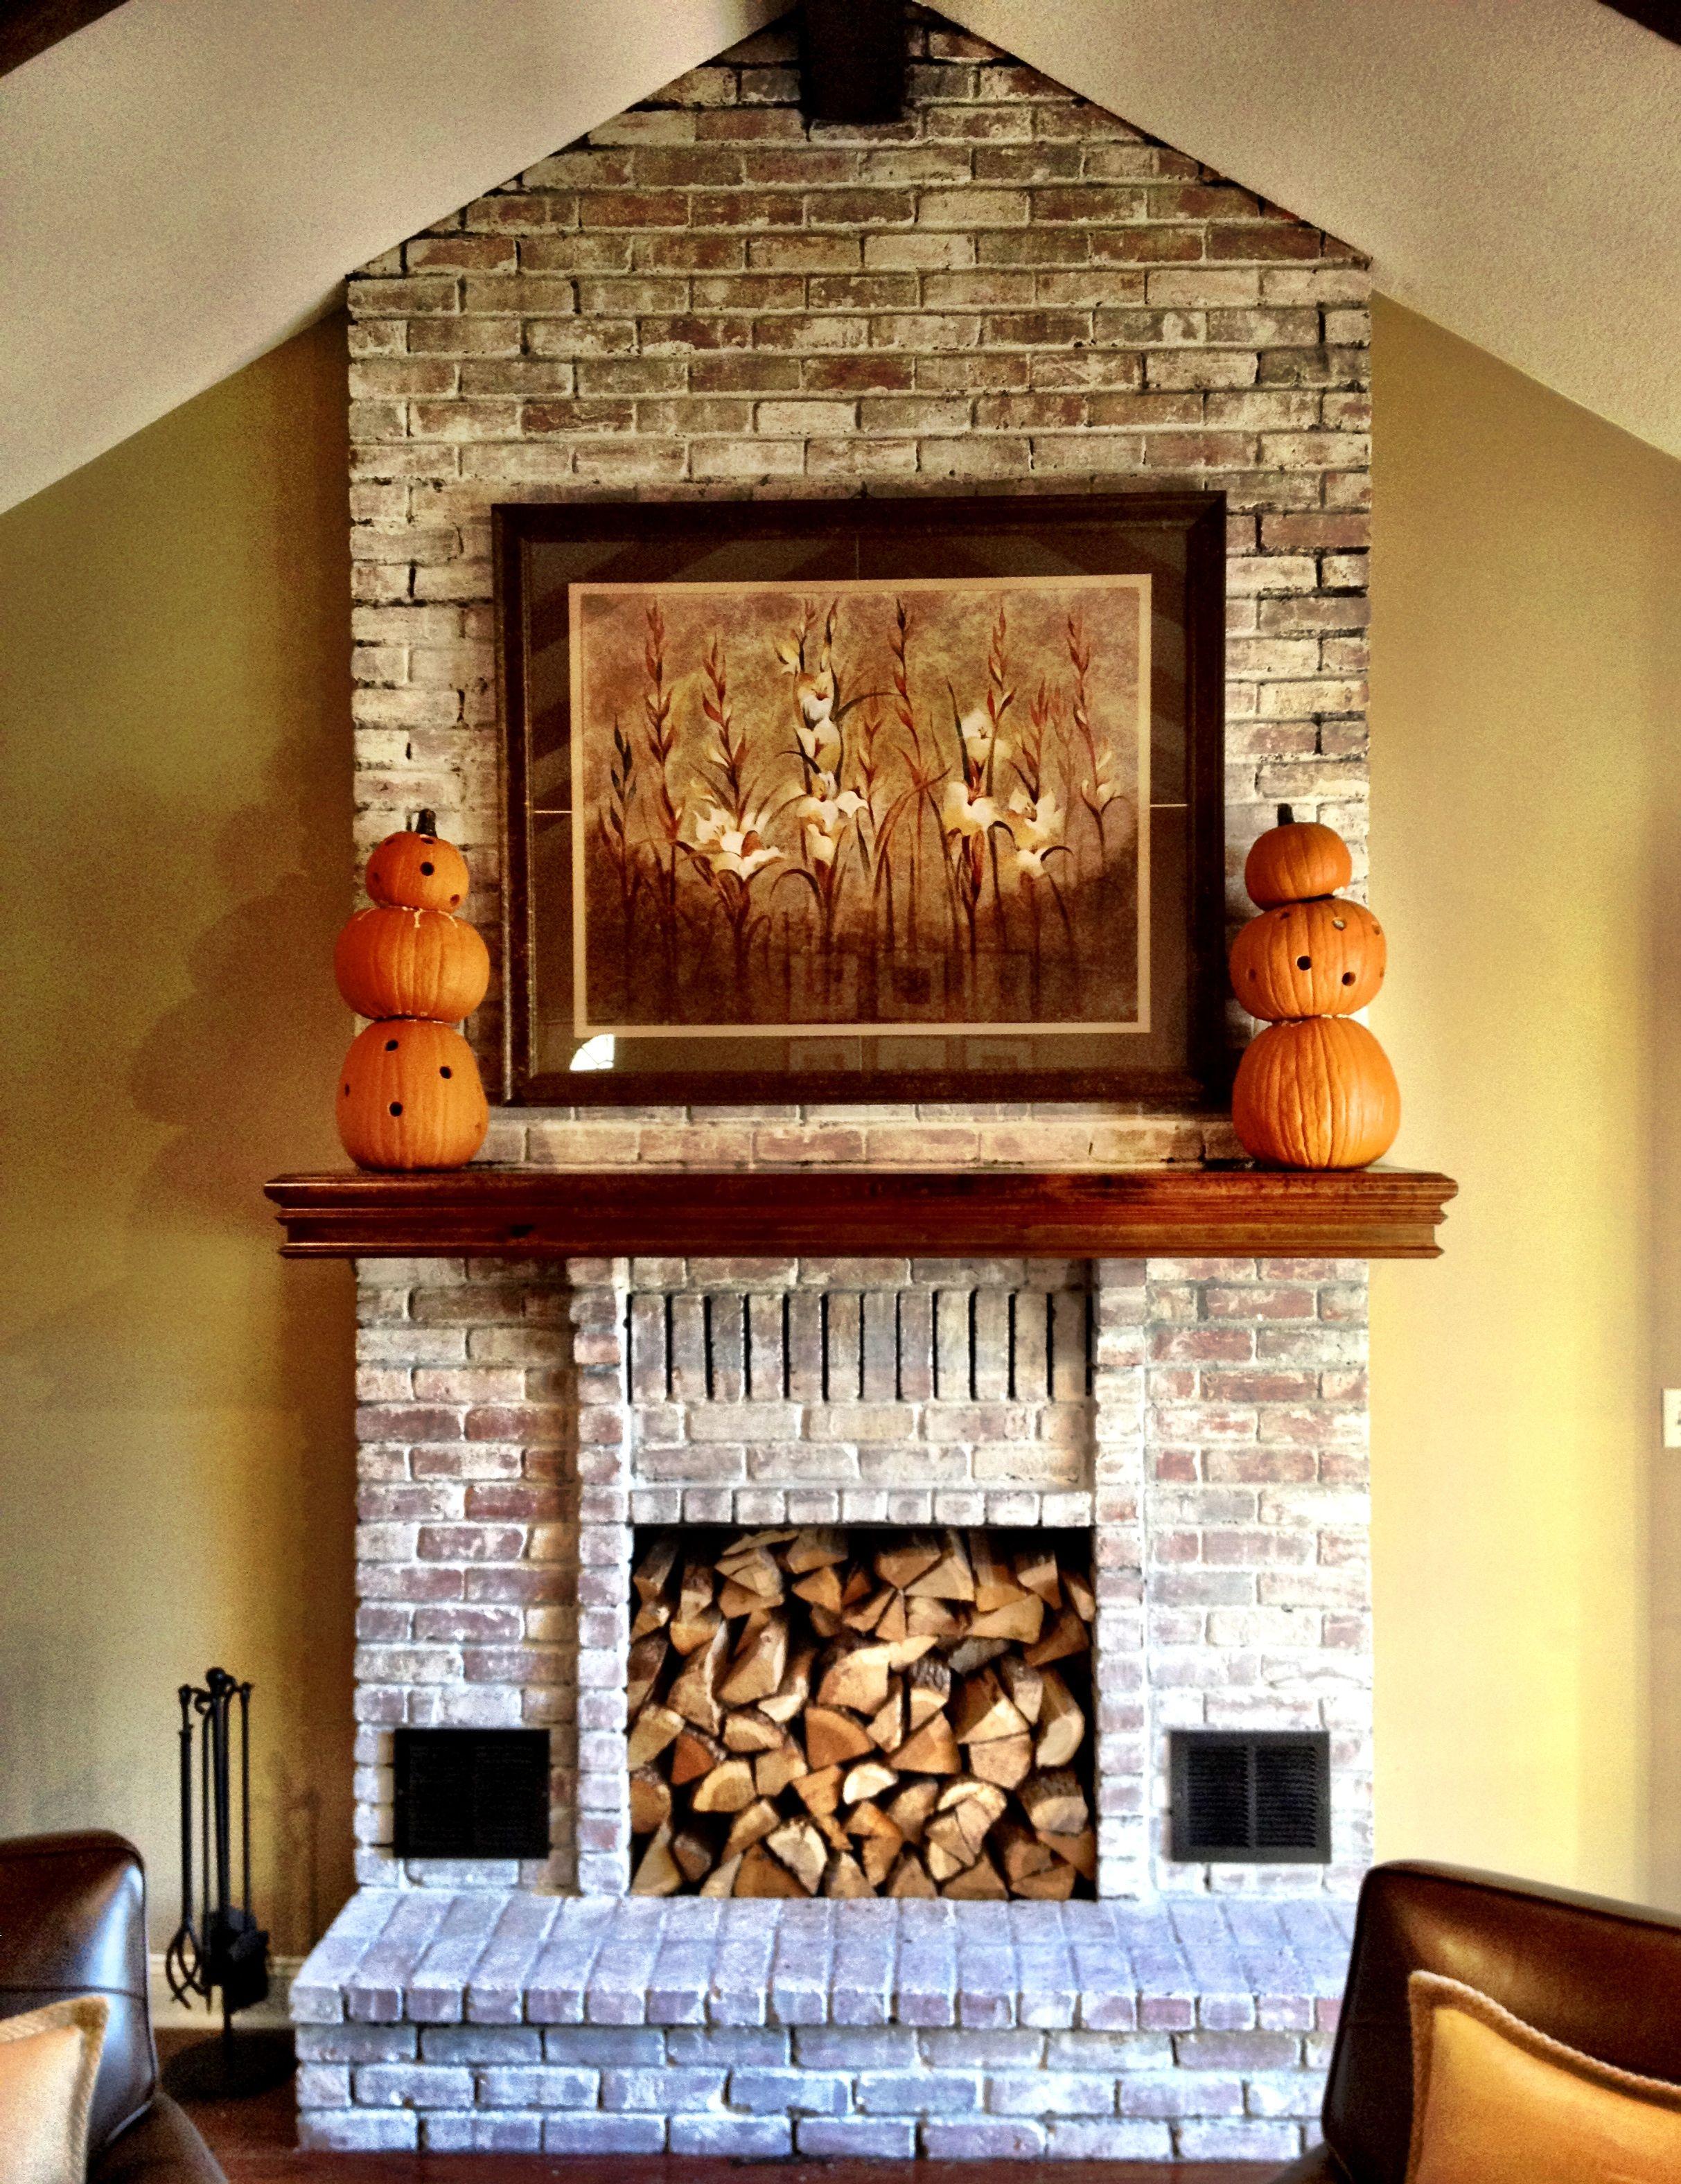 Best 25 White washed fireplace ideas on Pinterest  Fire place decor White wash fireplace and